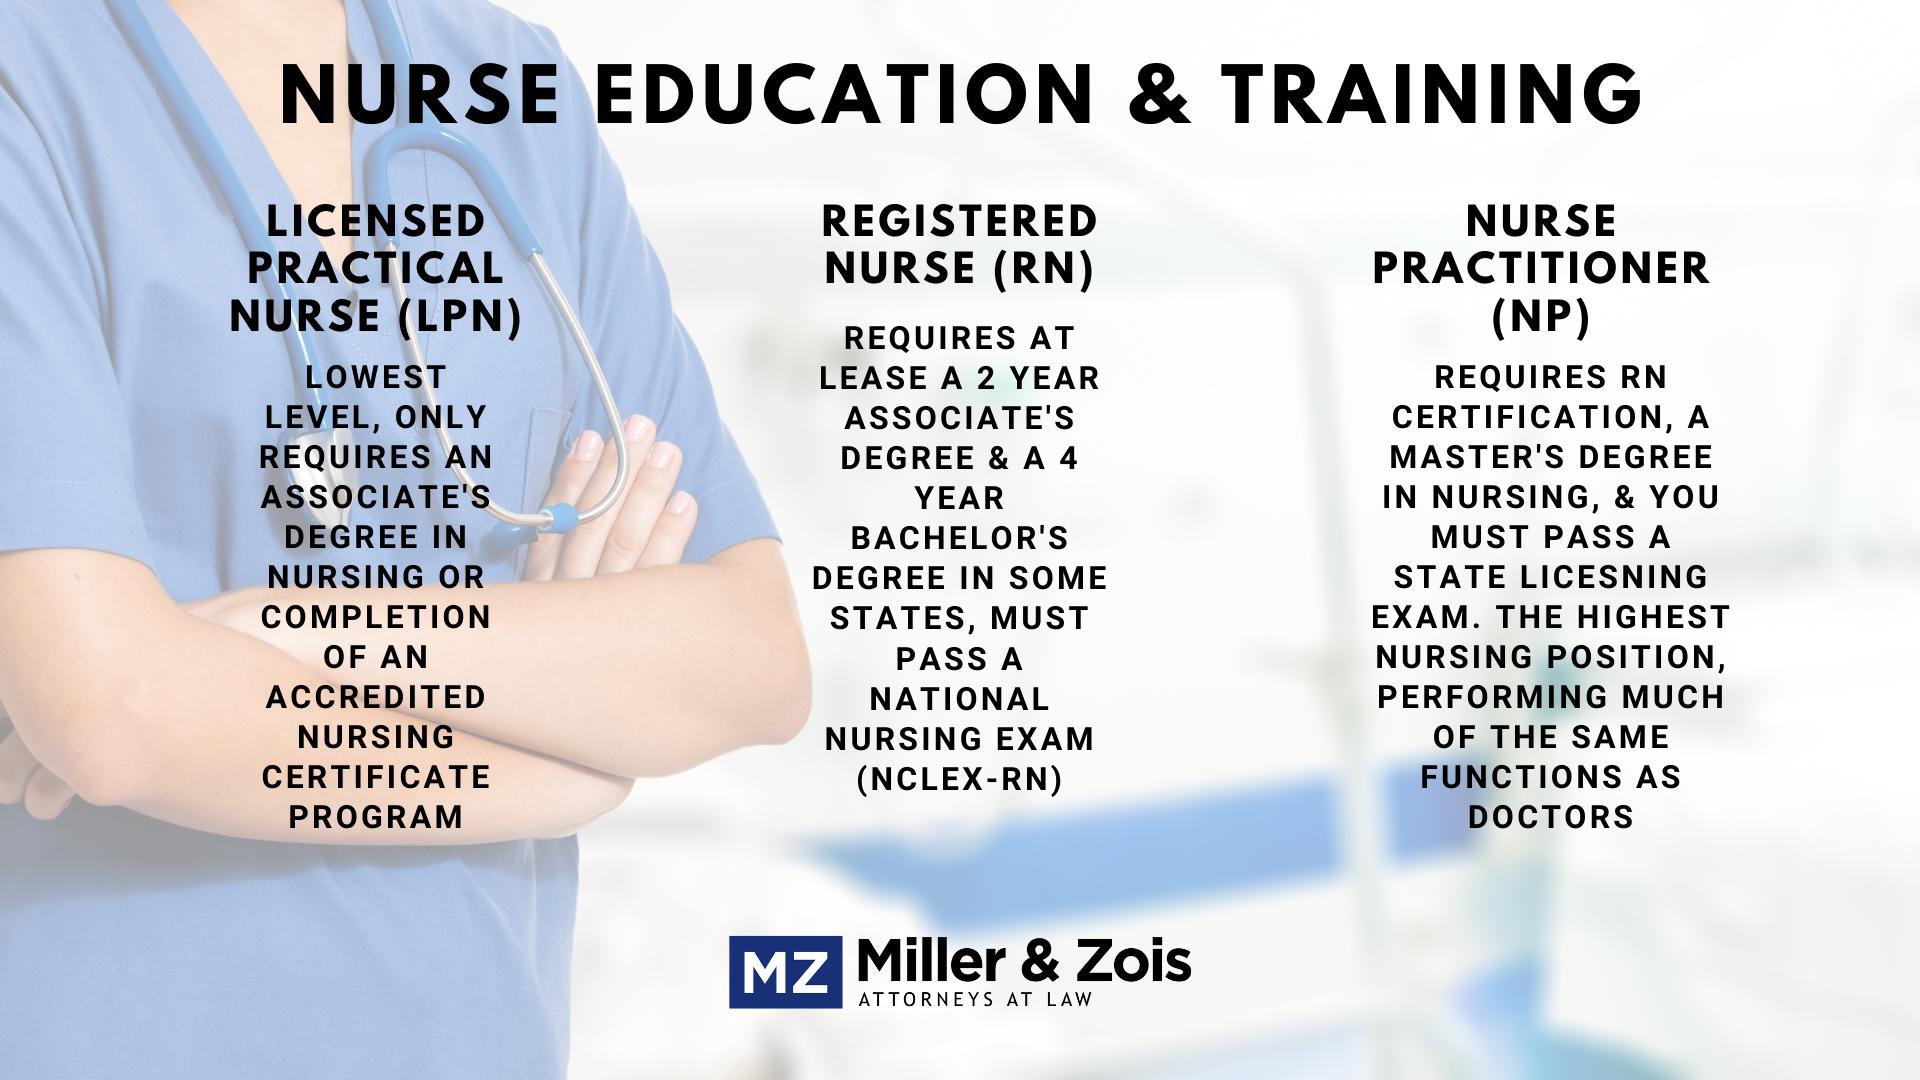 nurse education and training